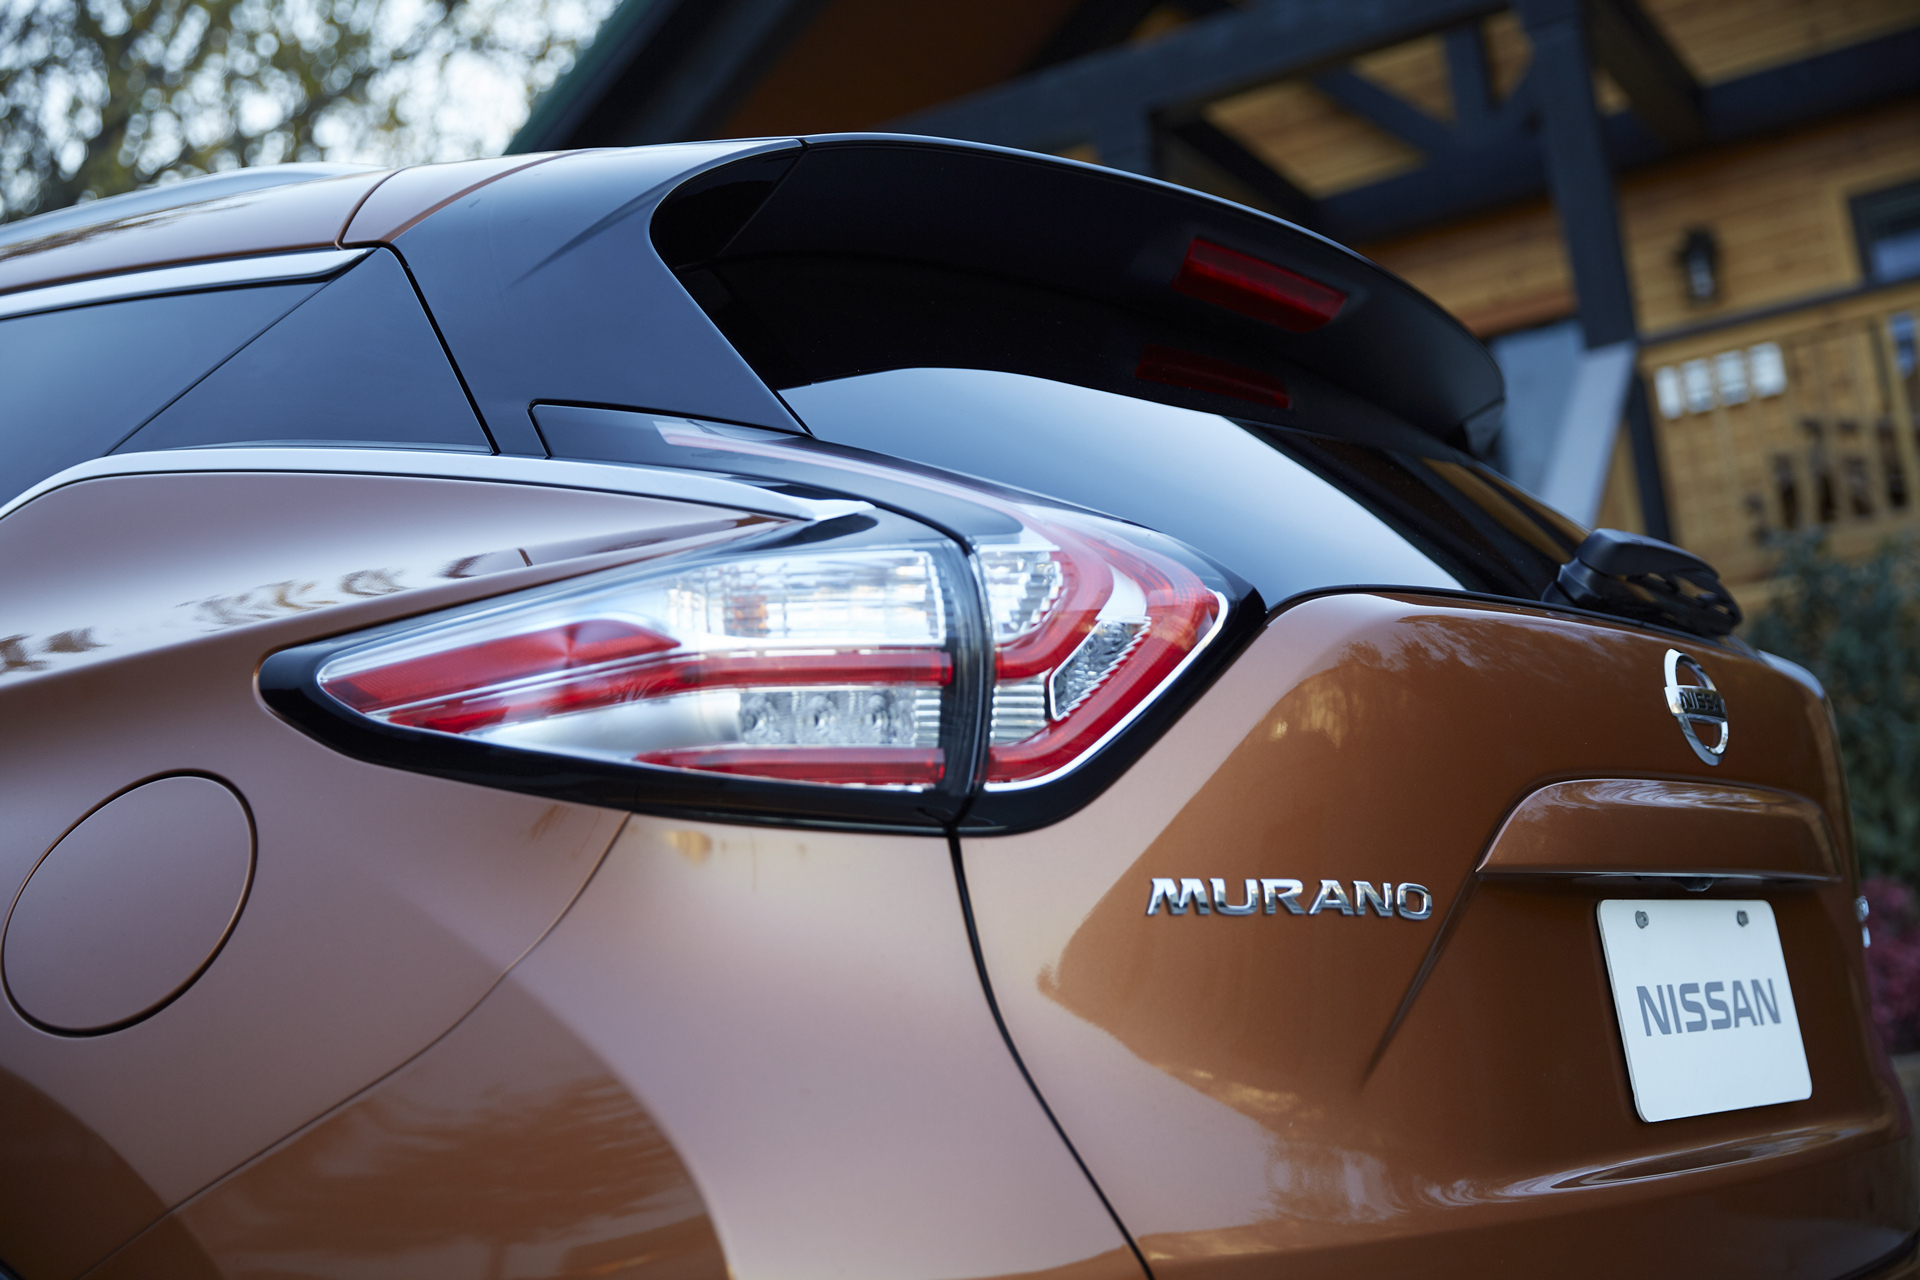 2016 Nissan Murano © Nissan Motor Co., Ltd.